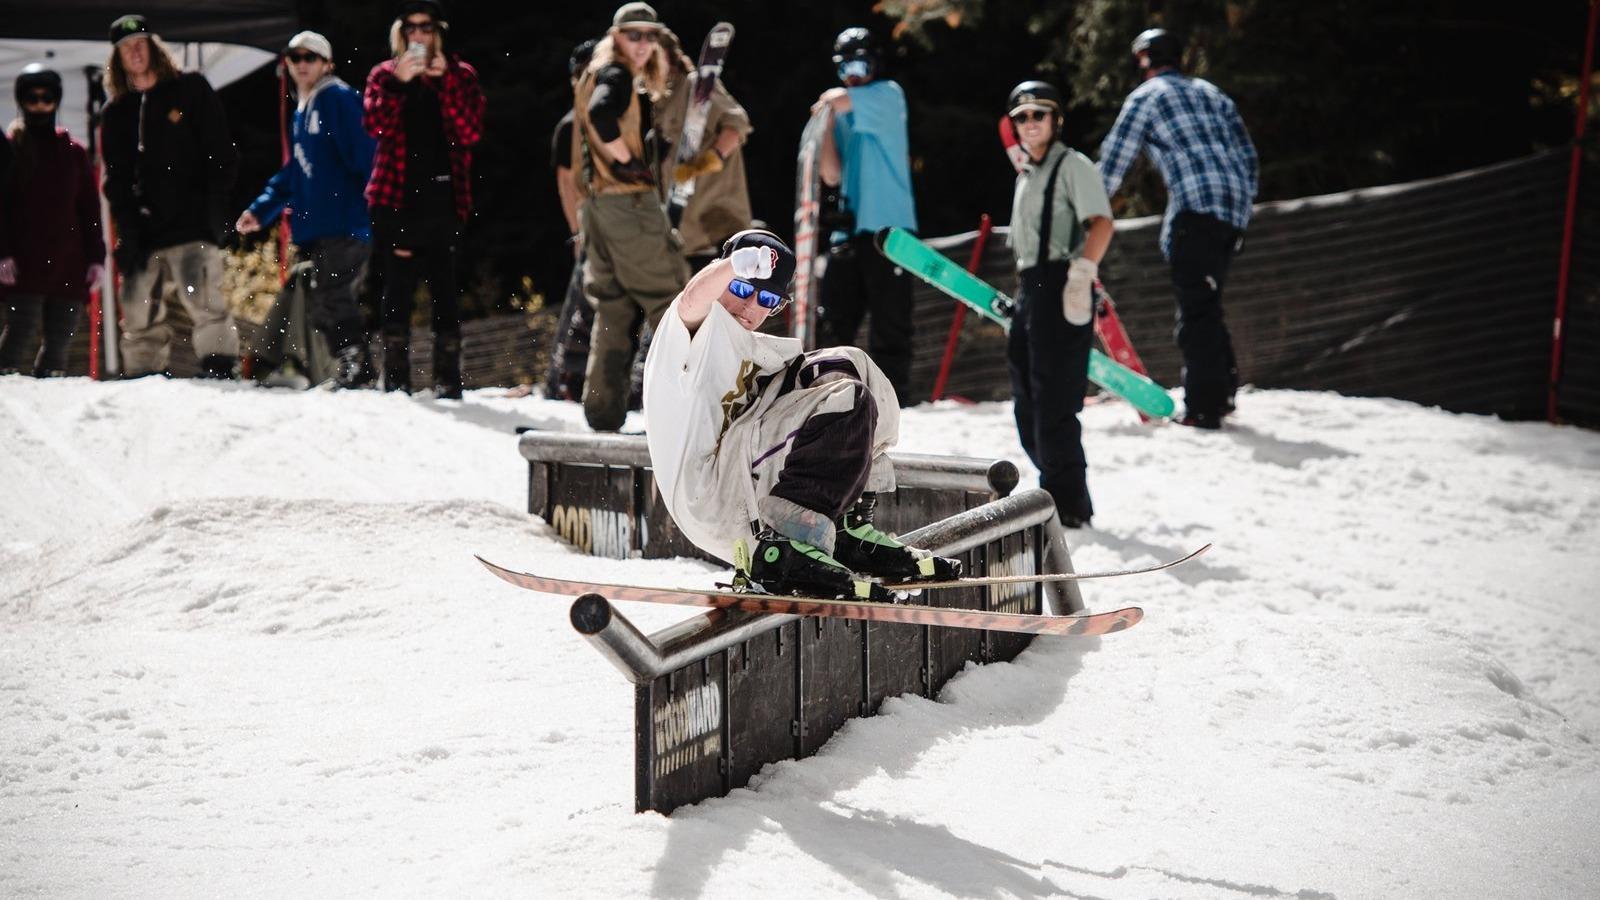 Flipboard The Top 35 Best Kept Secret Ski Resorts For